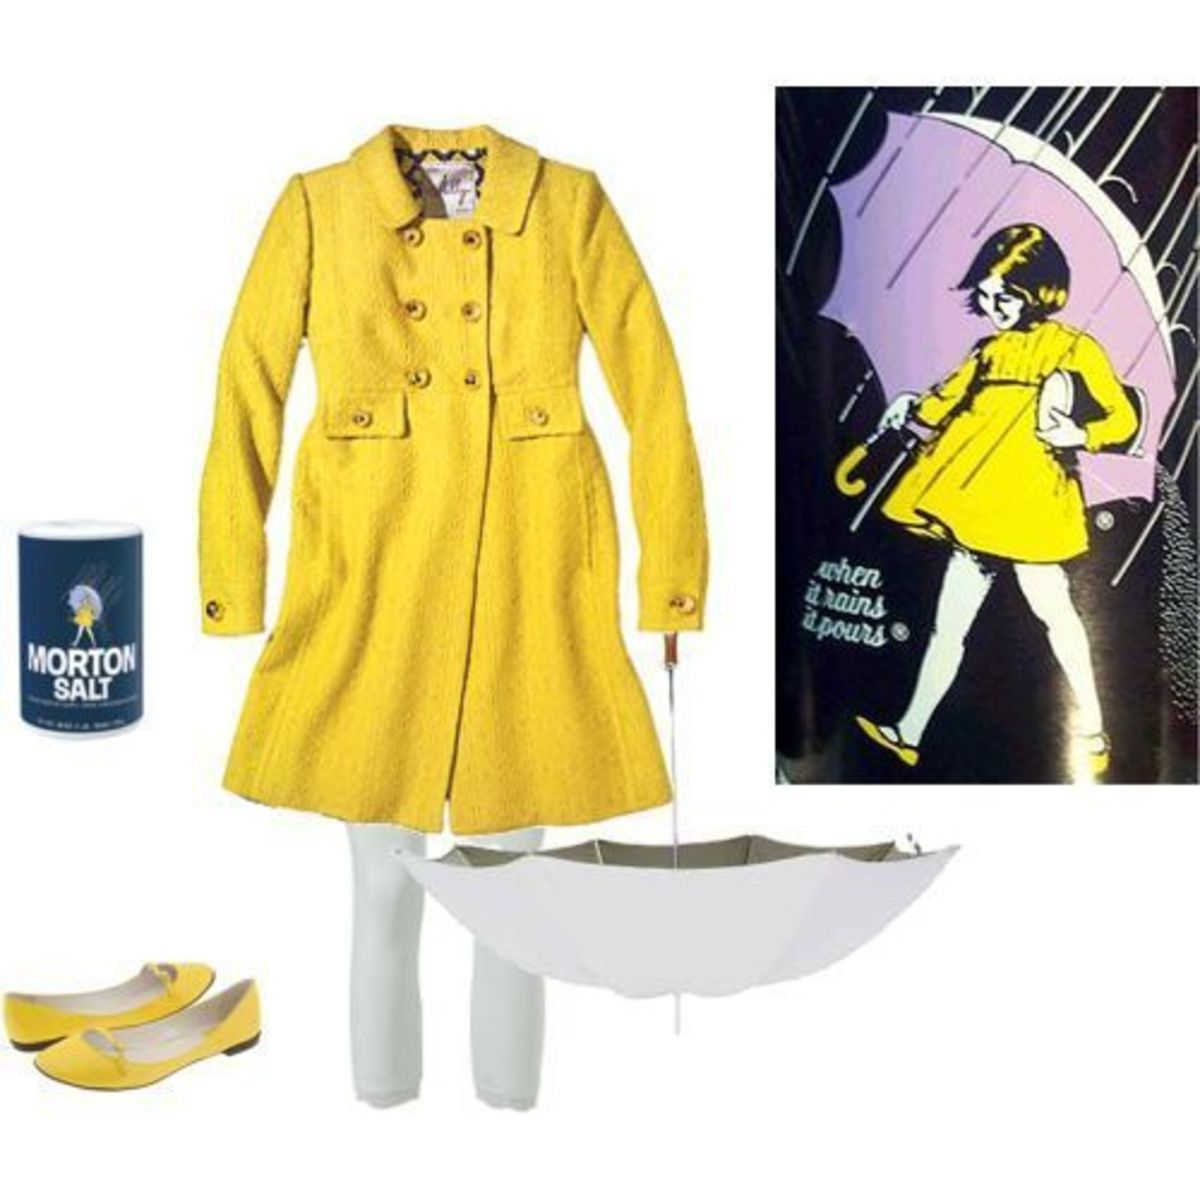 The Morton Salt Girl | DIY Halloween Costume Ideas